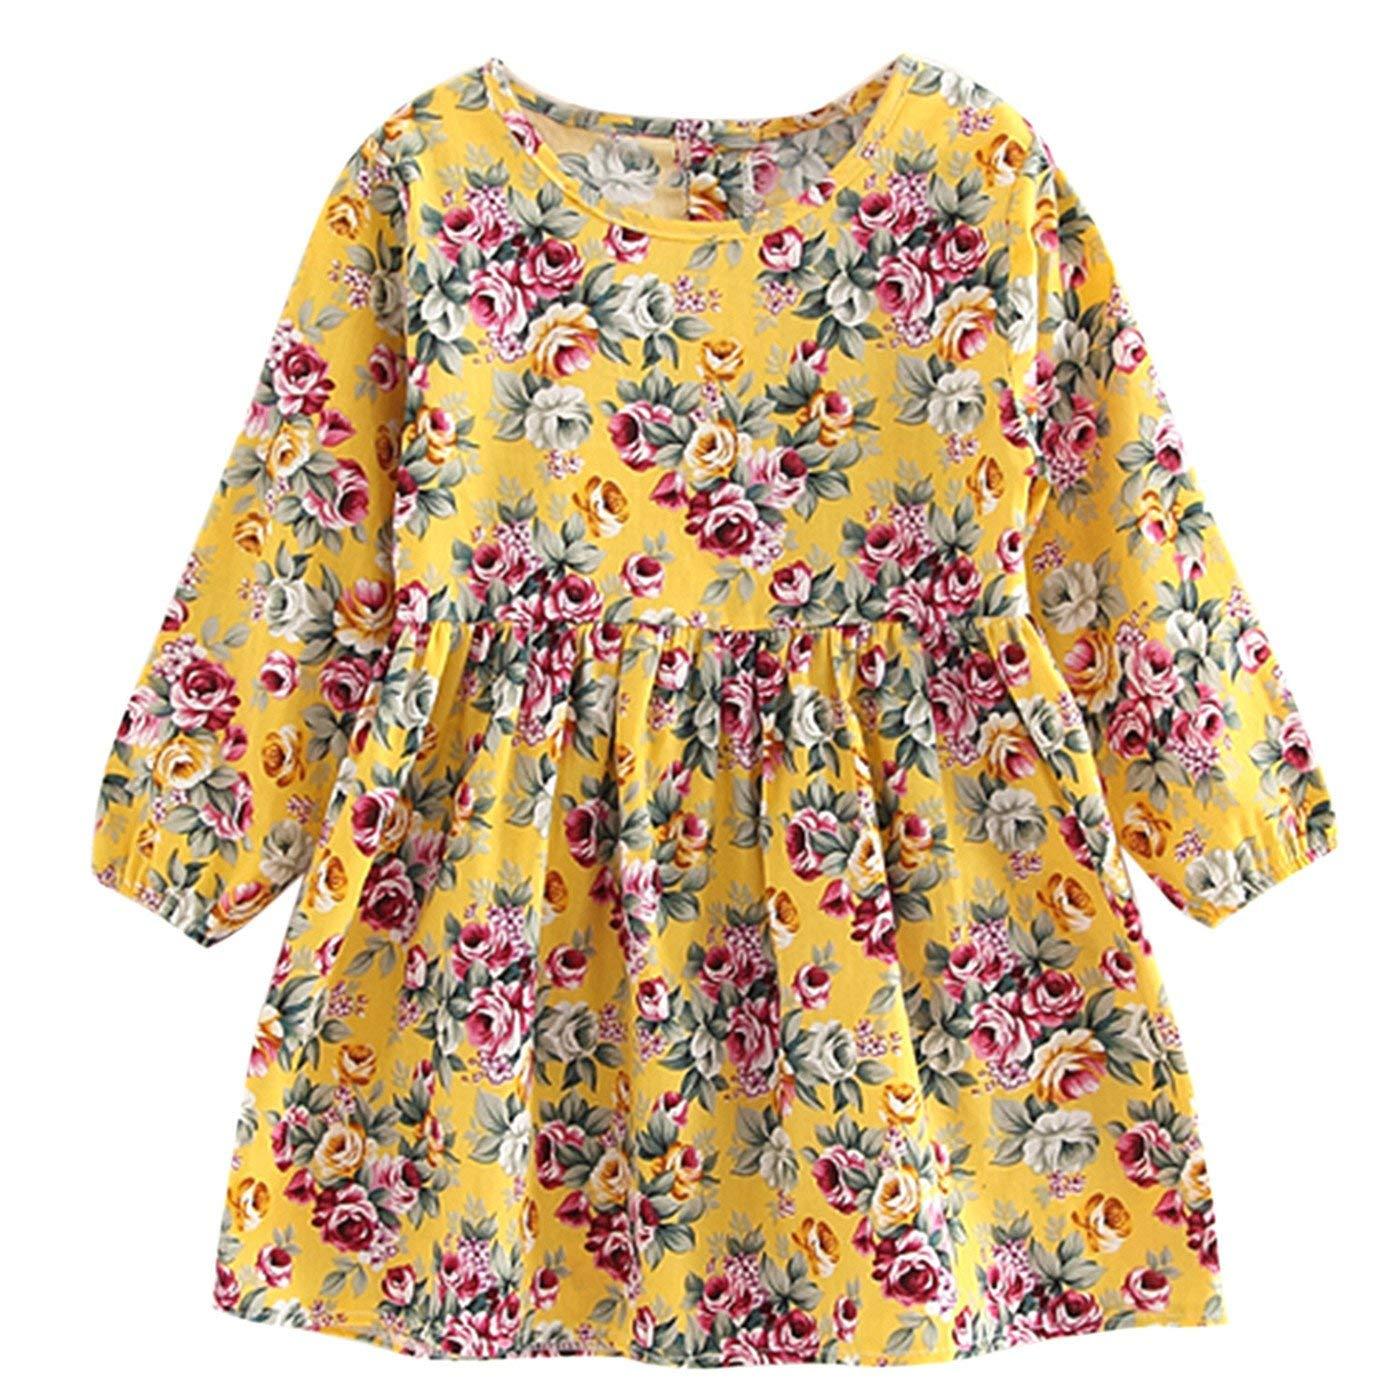 LIAOYLY Summer Baby Kids Dresses Children Girls Long Sleeve Floral Princess Dress Spring Girls,